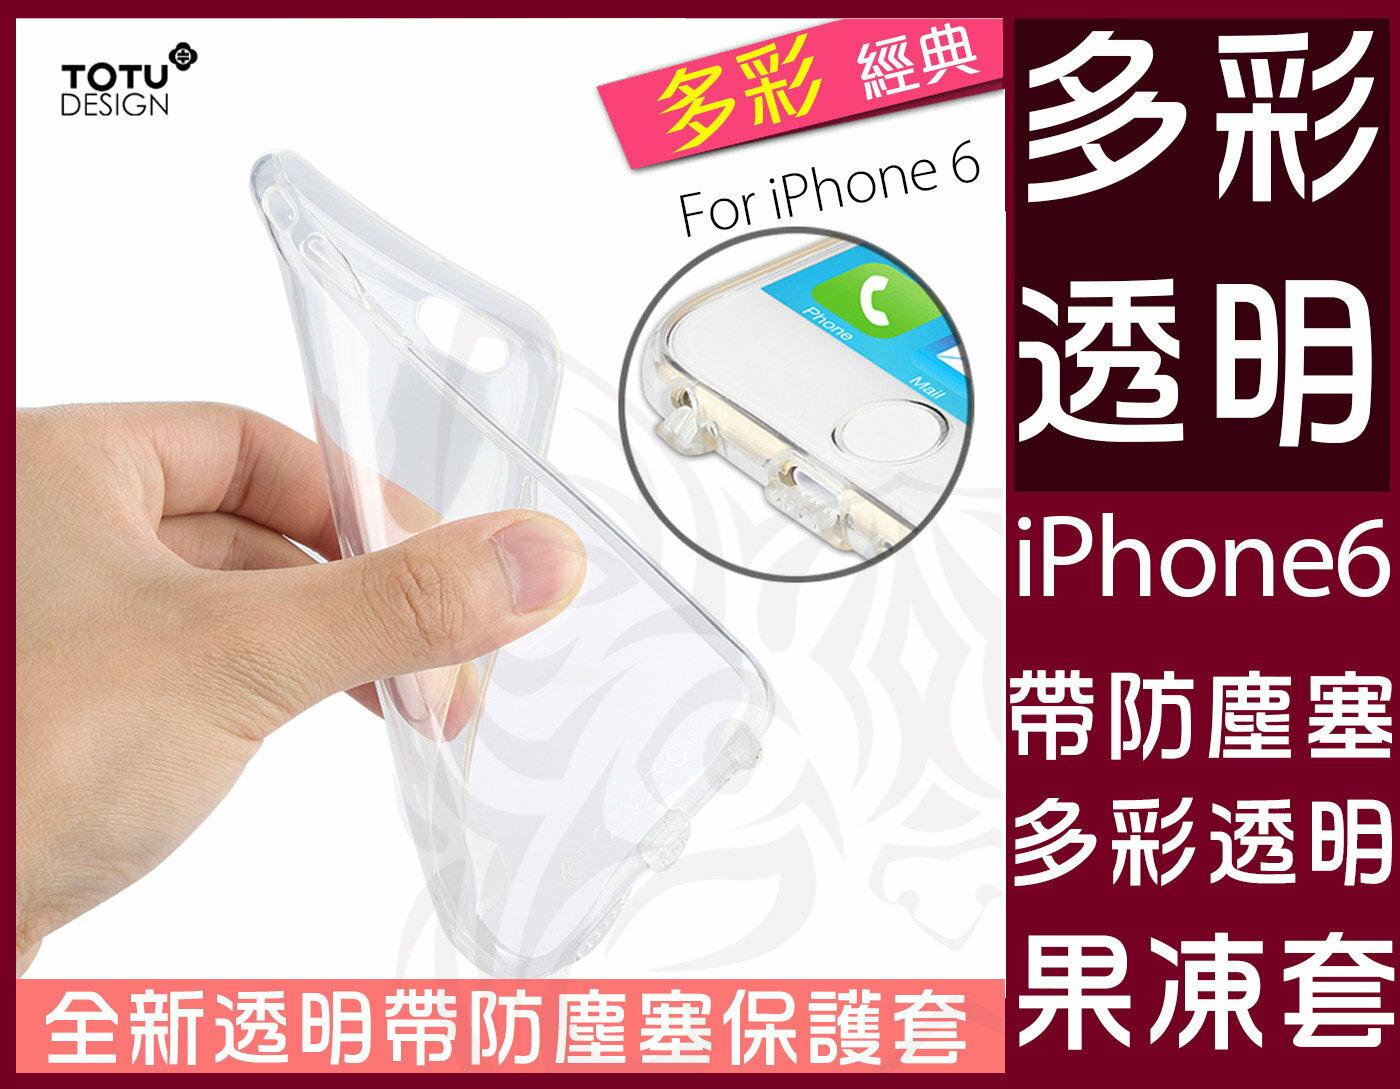 TOTU iPhone 6 透明保護殼【C-I6-015】帶防塵塞 多彩隱形套 手機殼 4.7吋 Alice3C - 限時優惠好康折扣